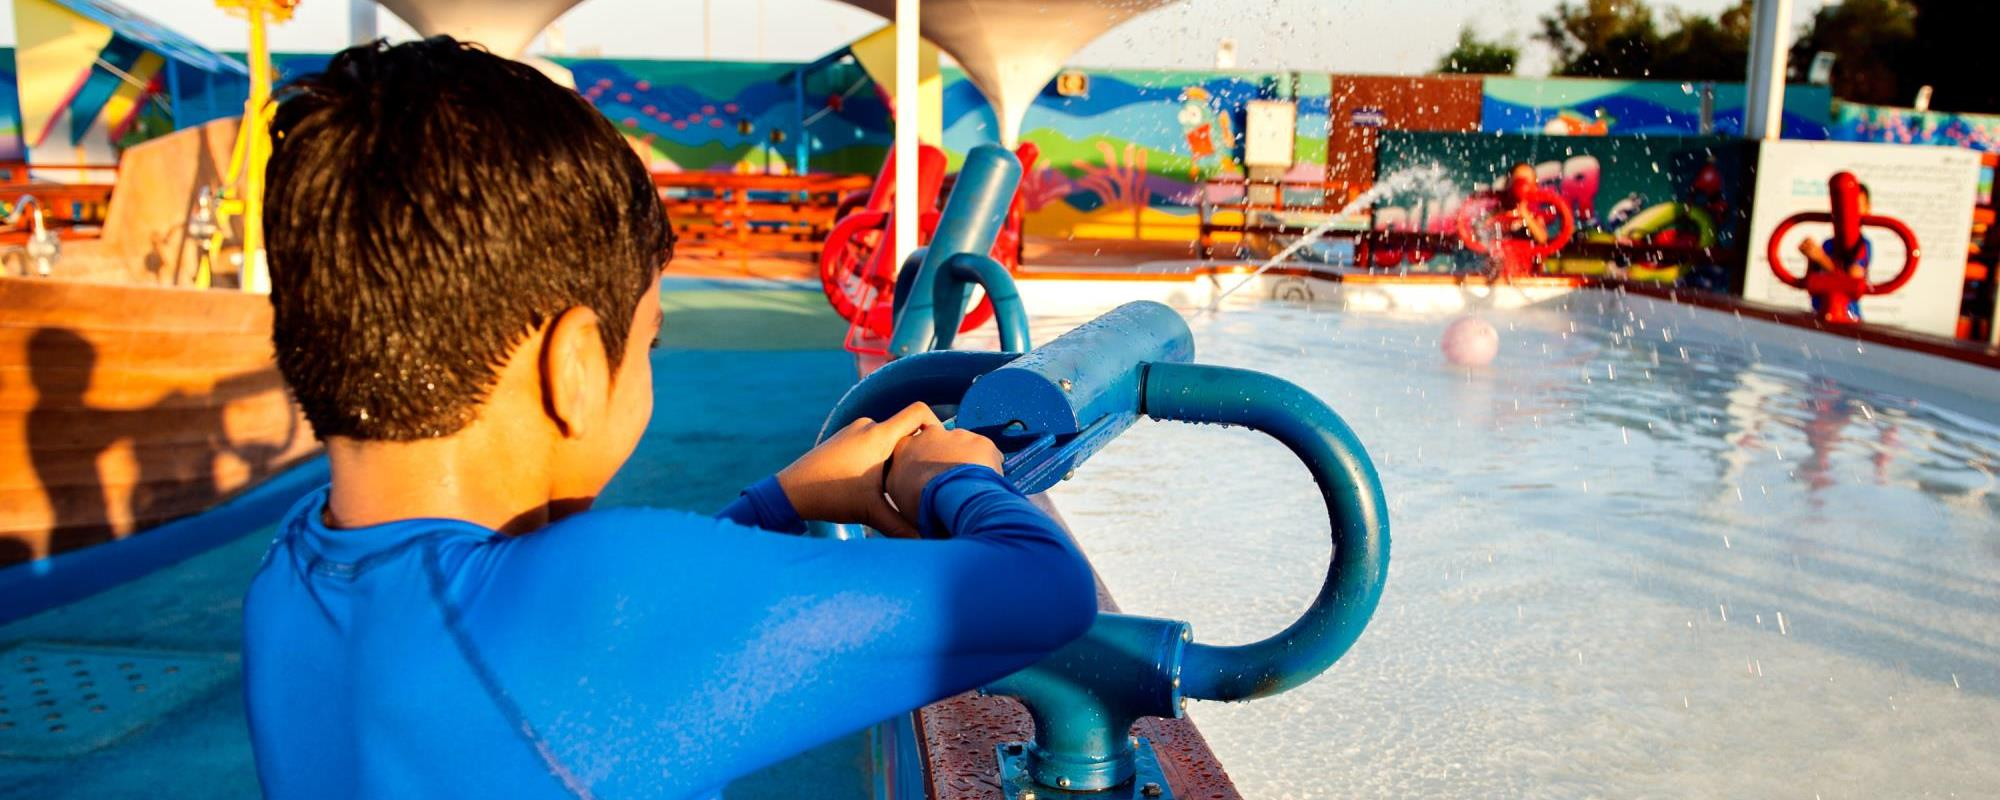 Murjan-Splash-Park-Hero